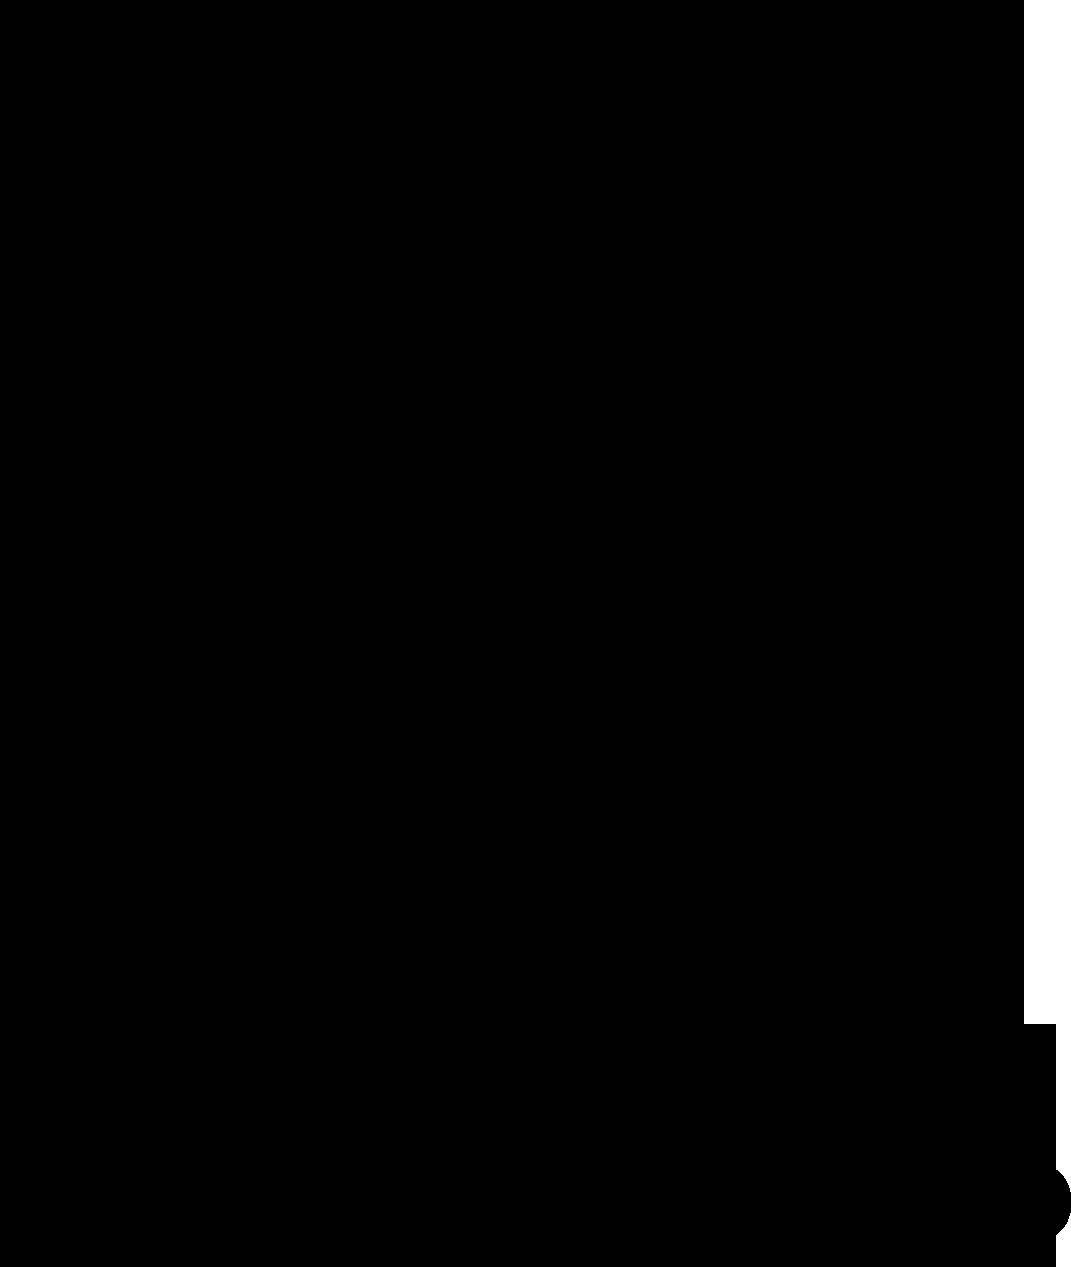 muusikkojen-liitto-logo-01.png